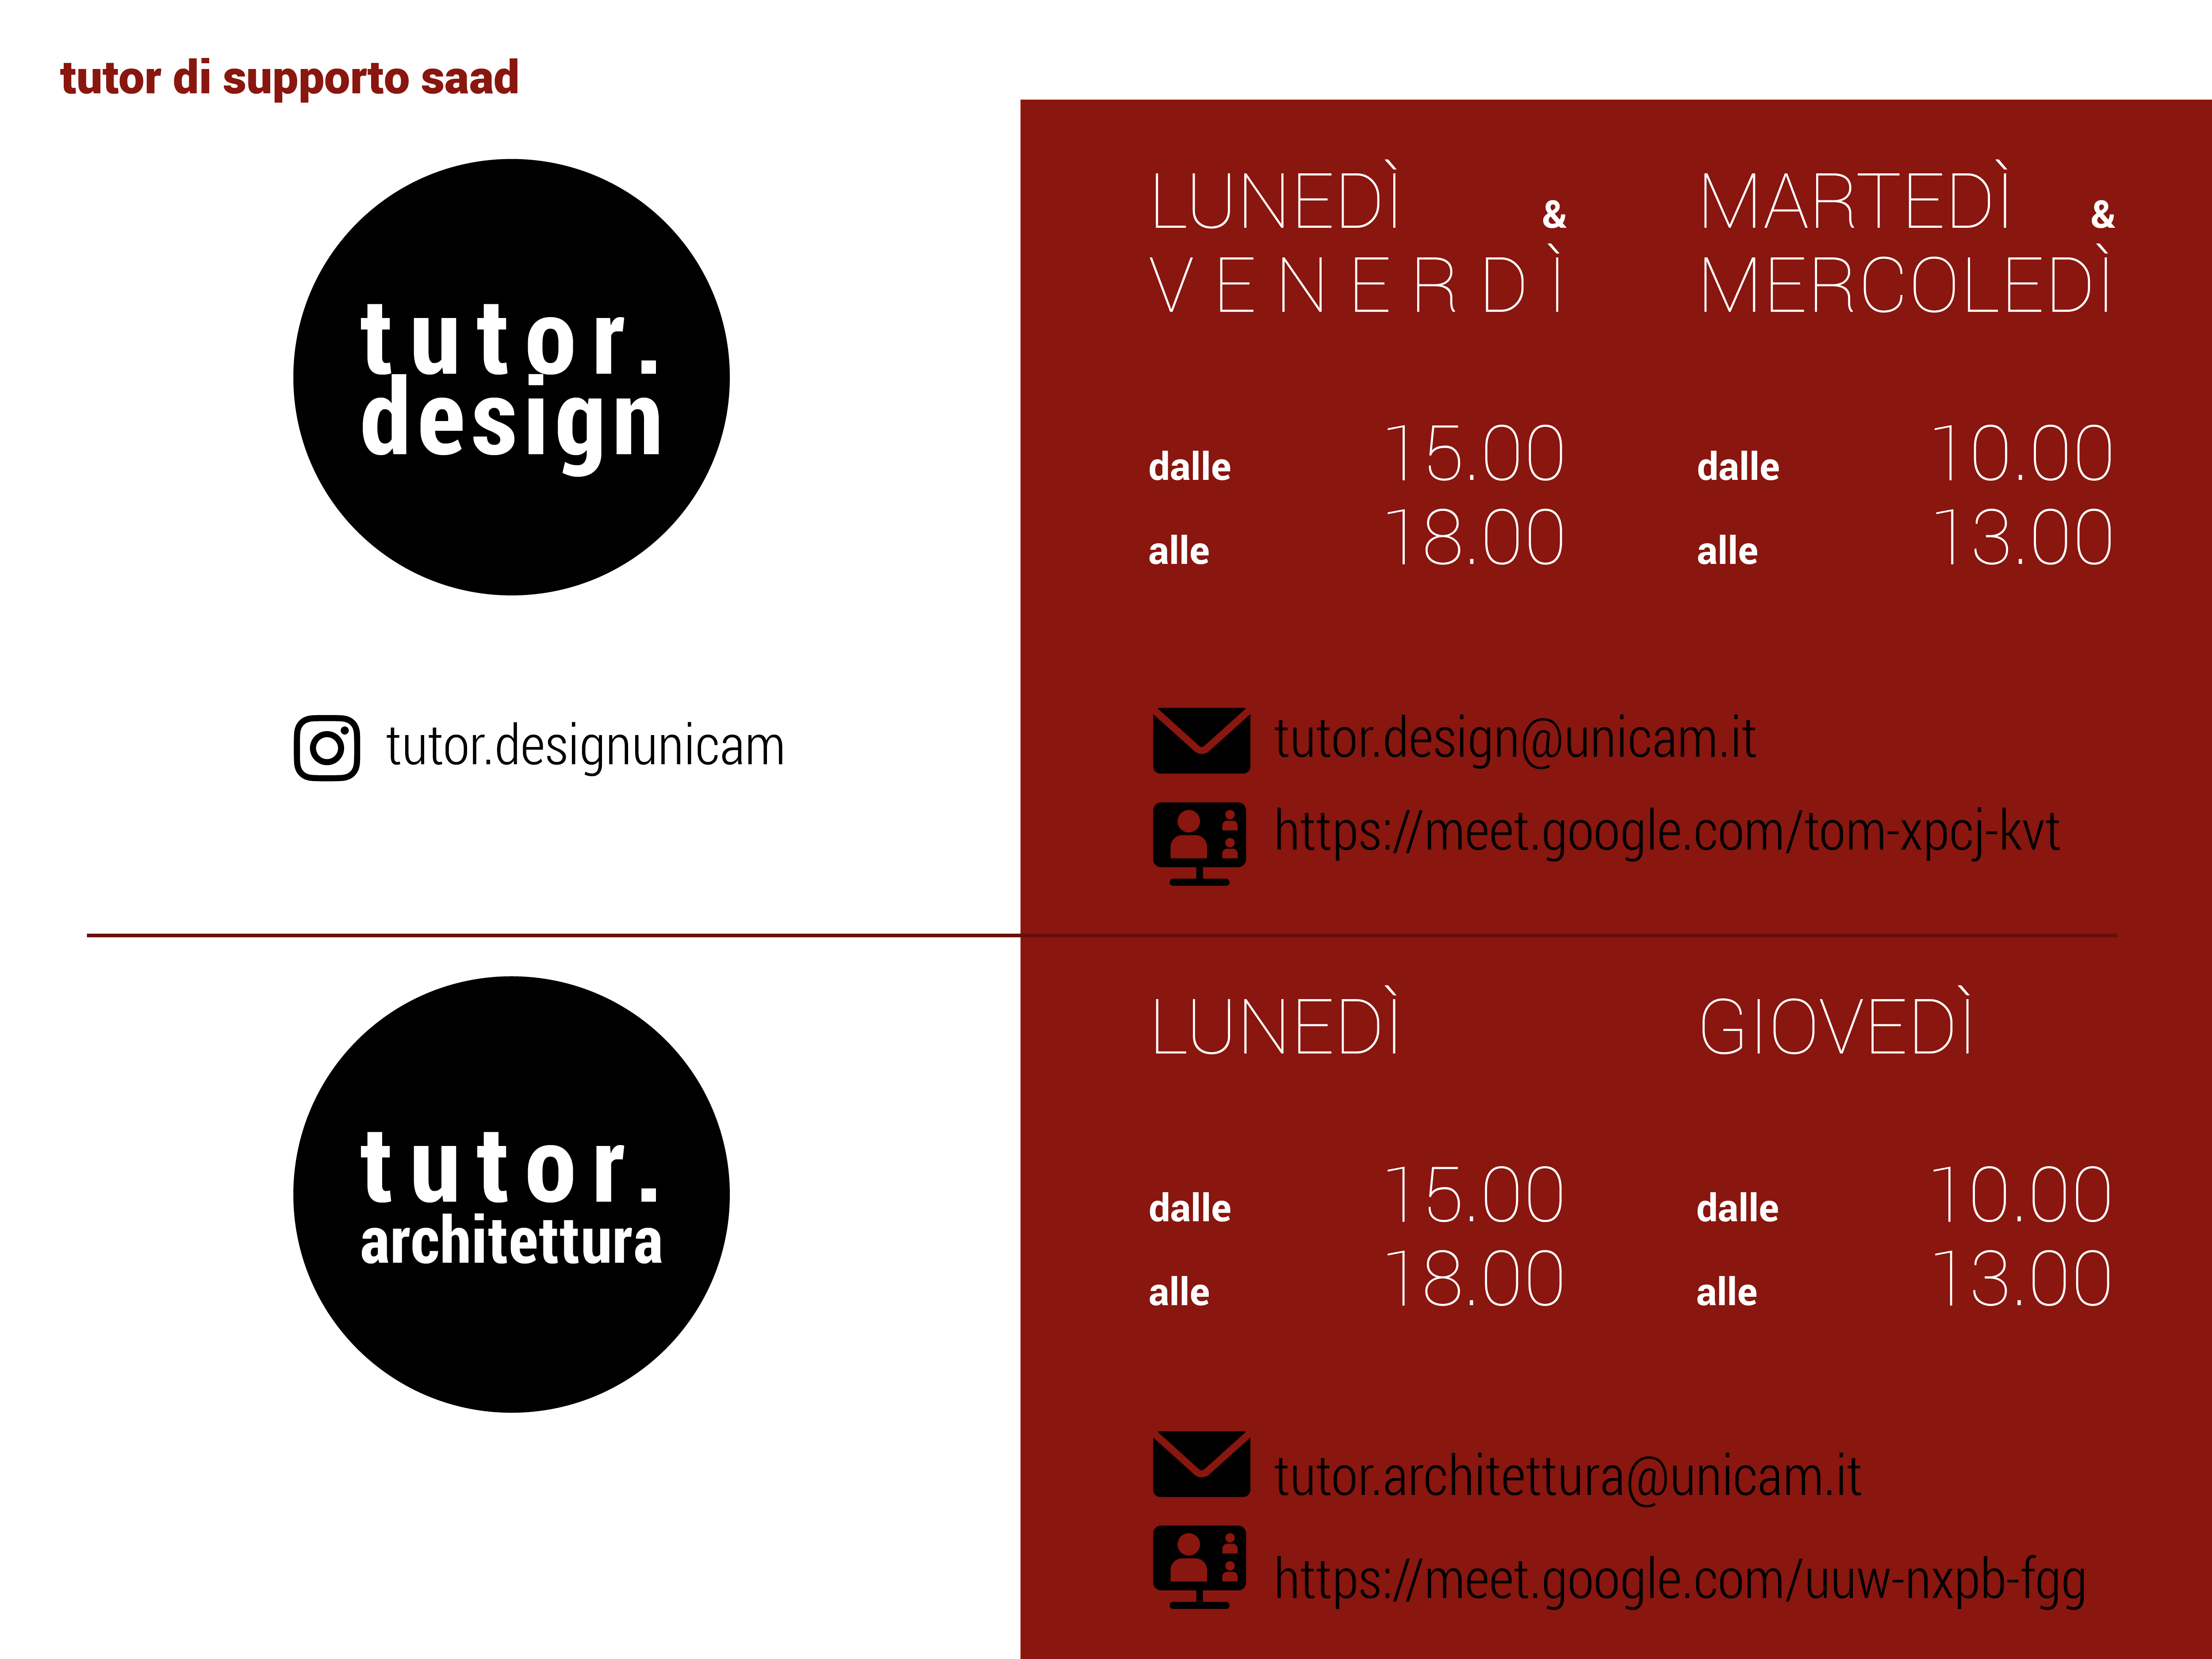 tutor design